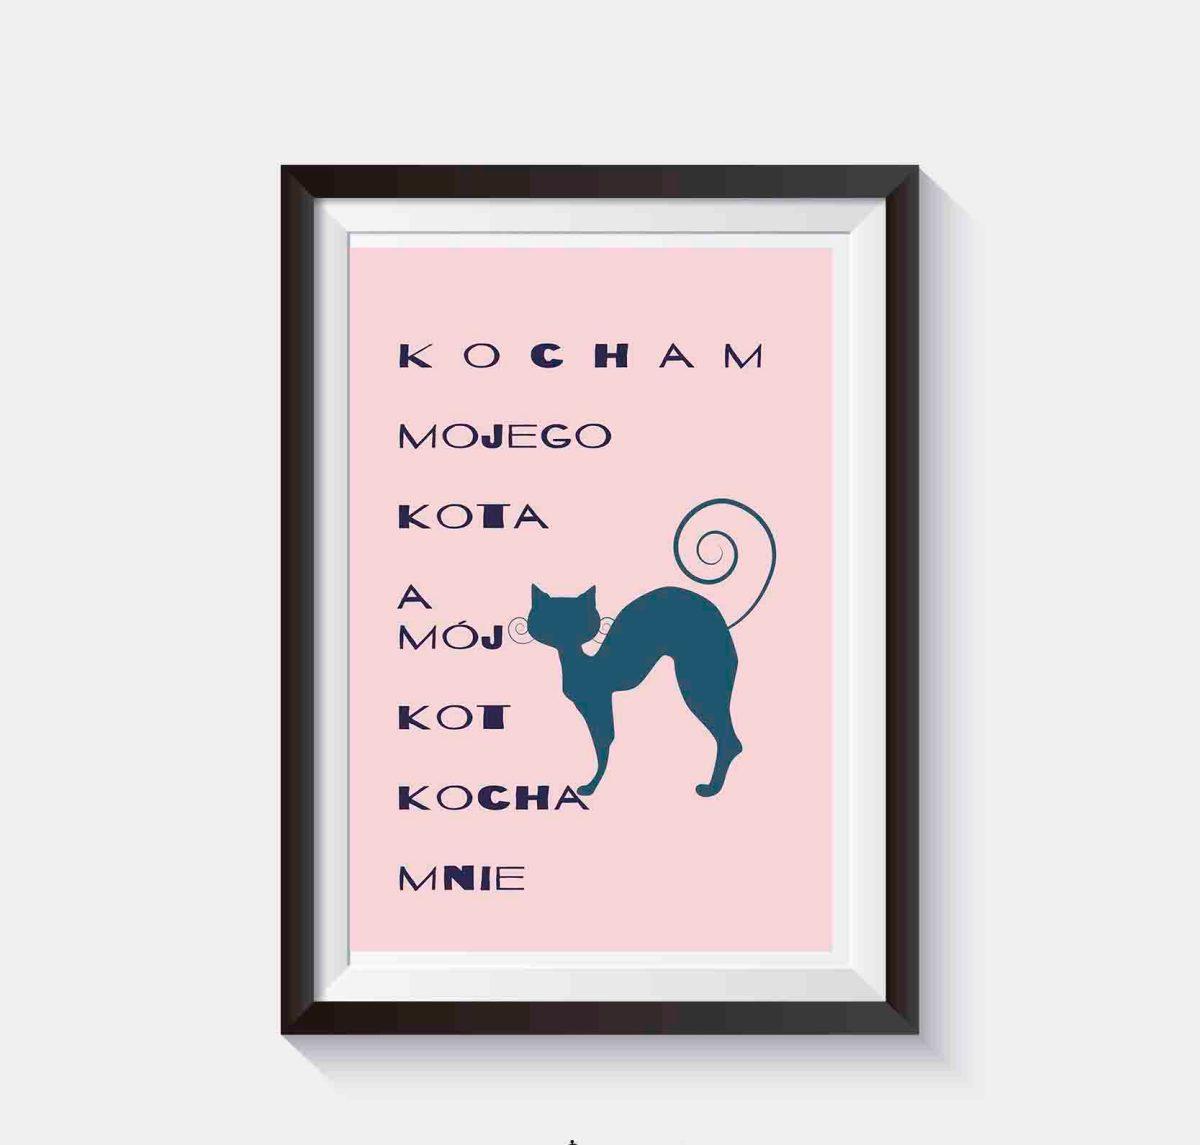 Plakat z sentencją Kocham mojego kota